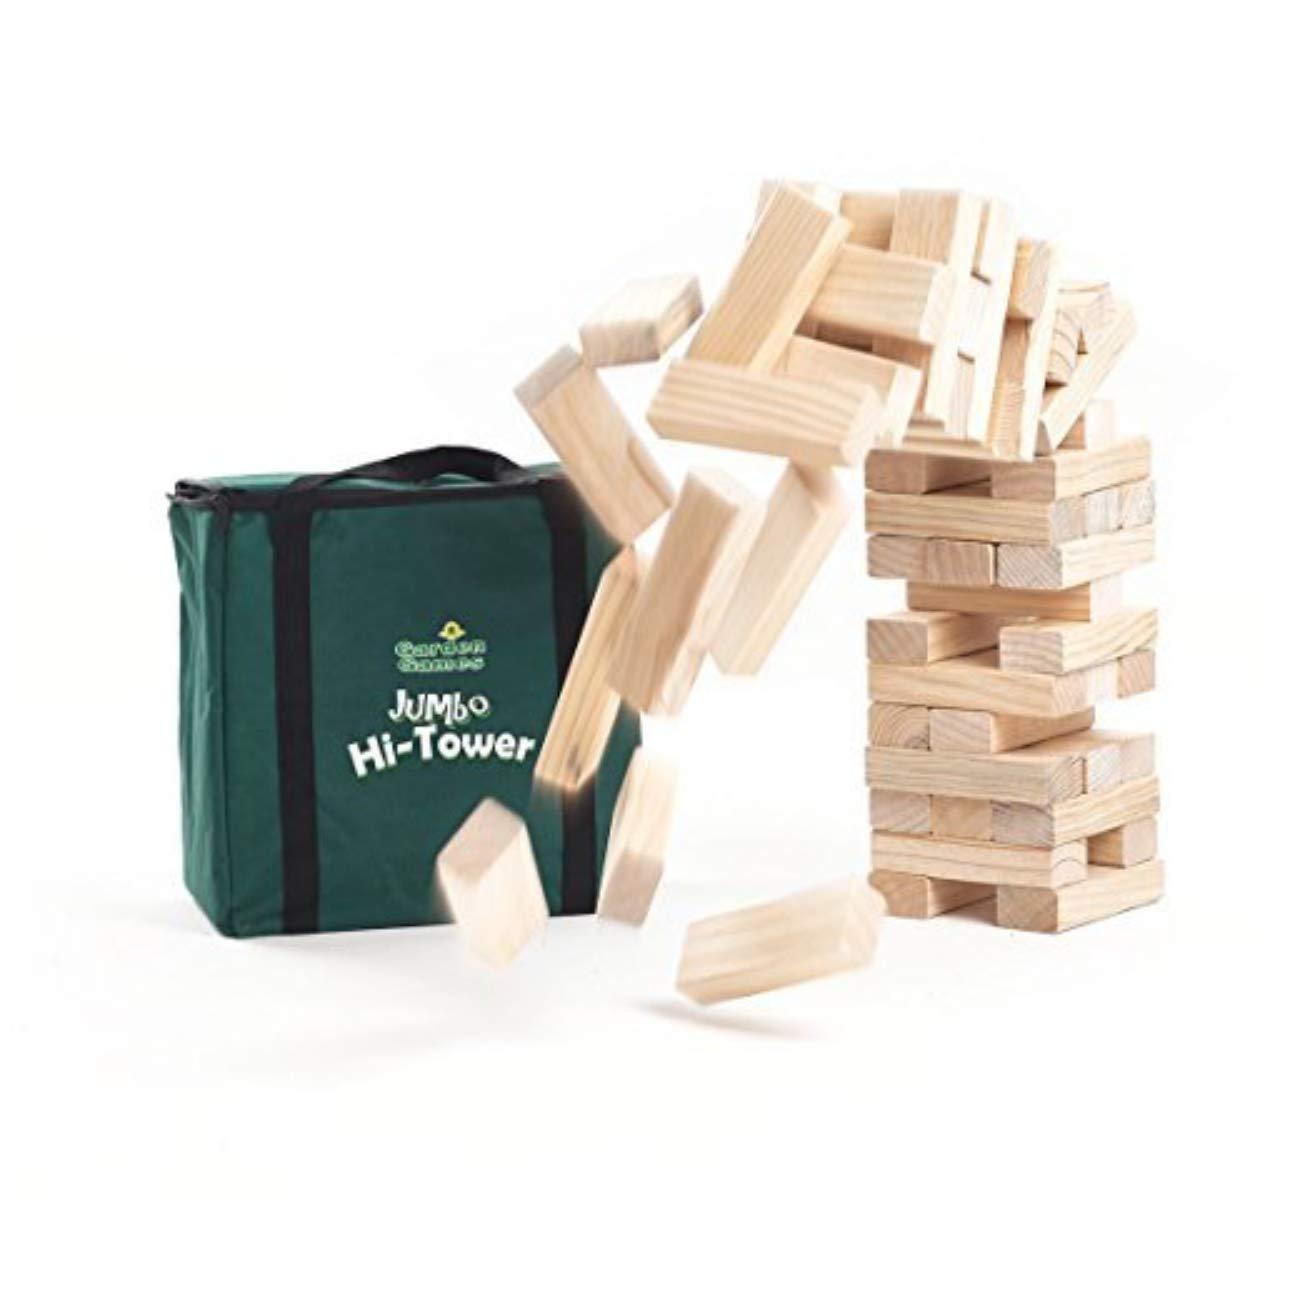 Jumbo Hi-Tower | Tumbling Tower Game | 60'' | with Carry/Storage Bag